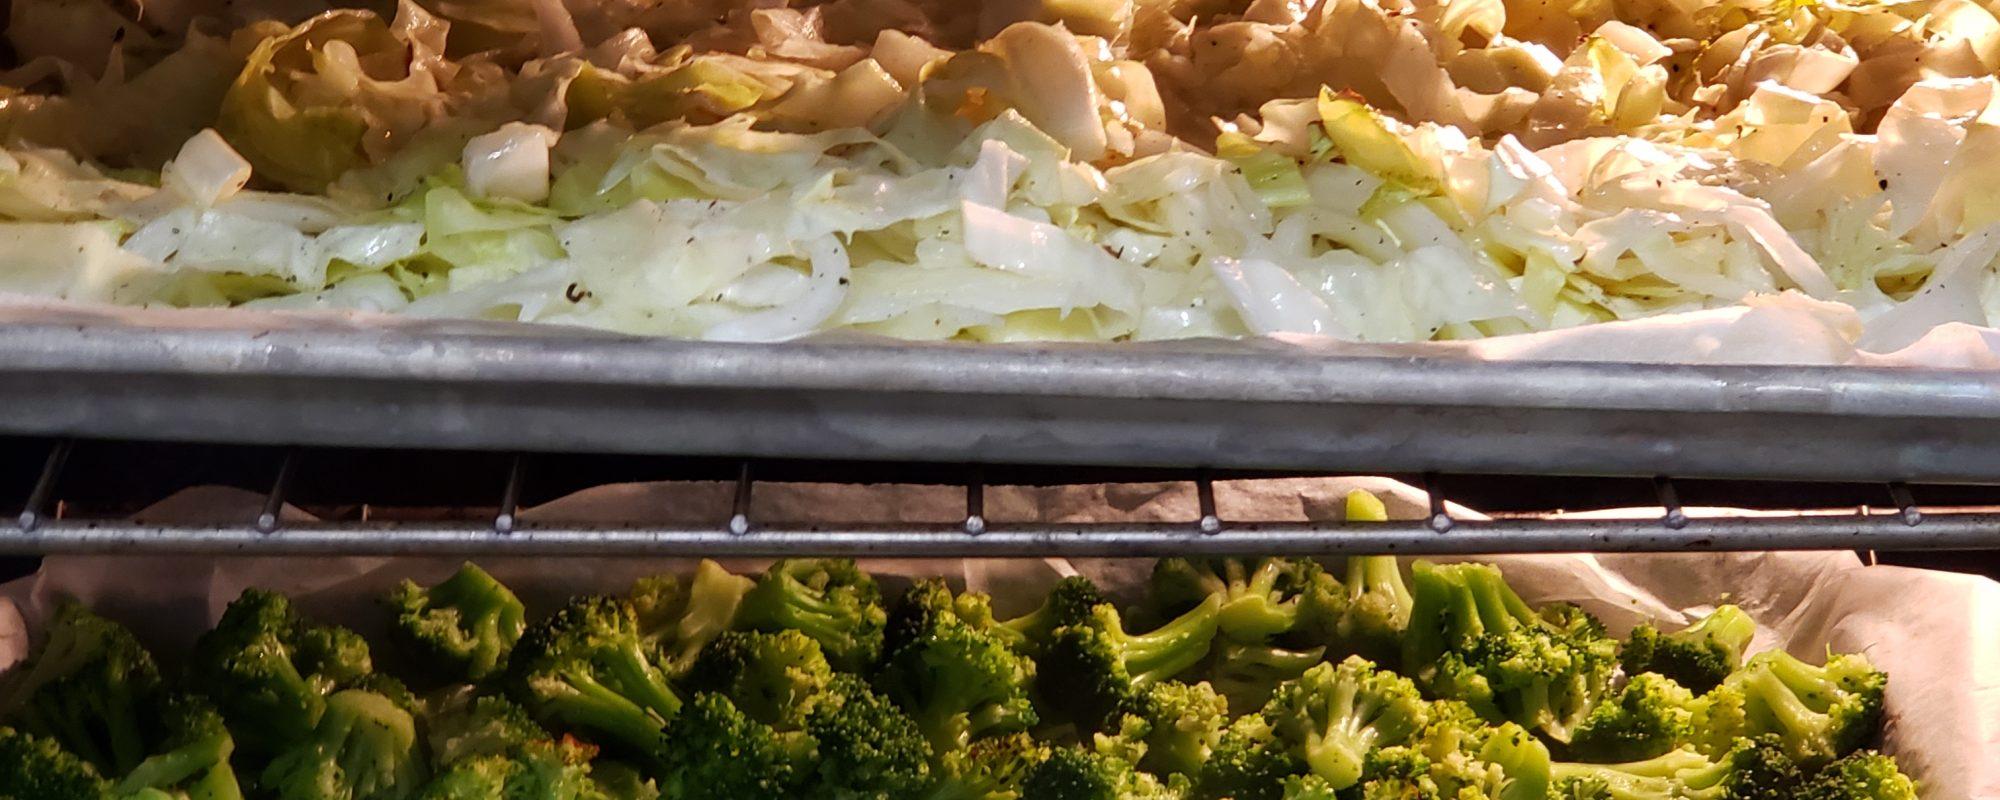 Cabbage & Broccoli for Beef Divan